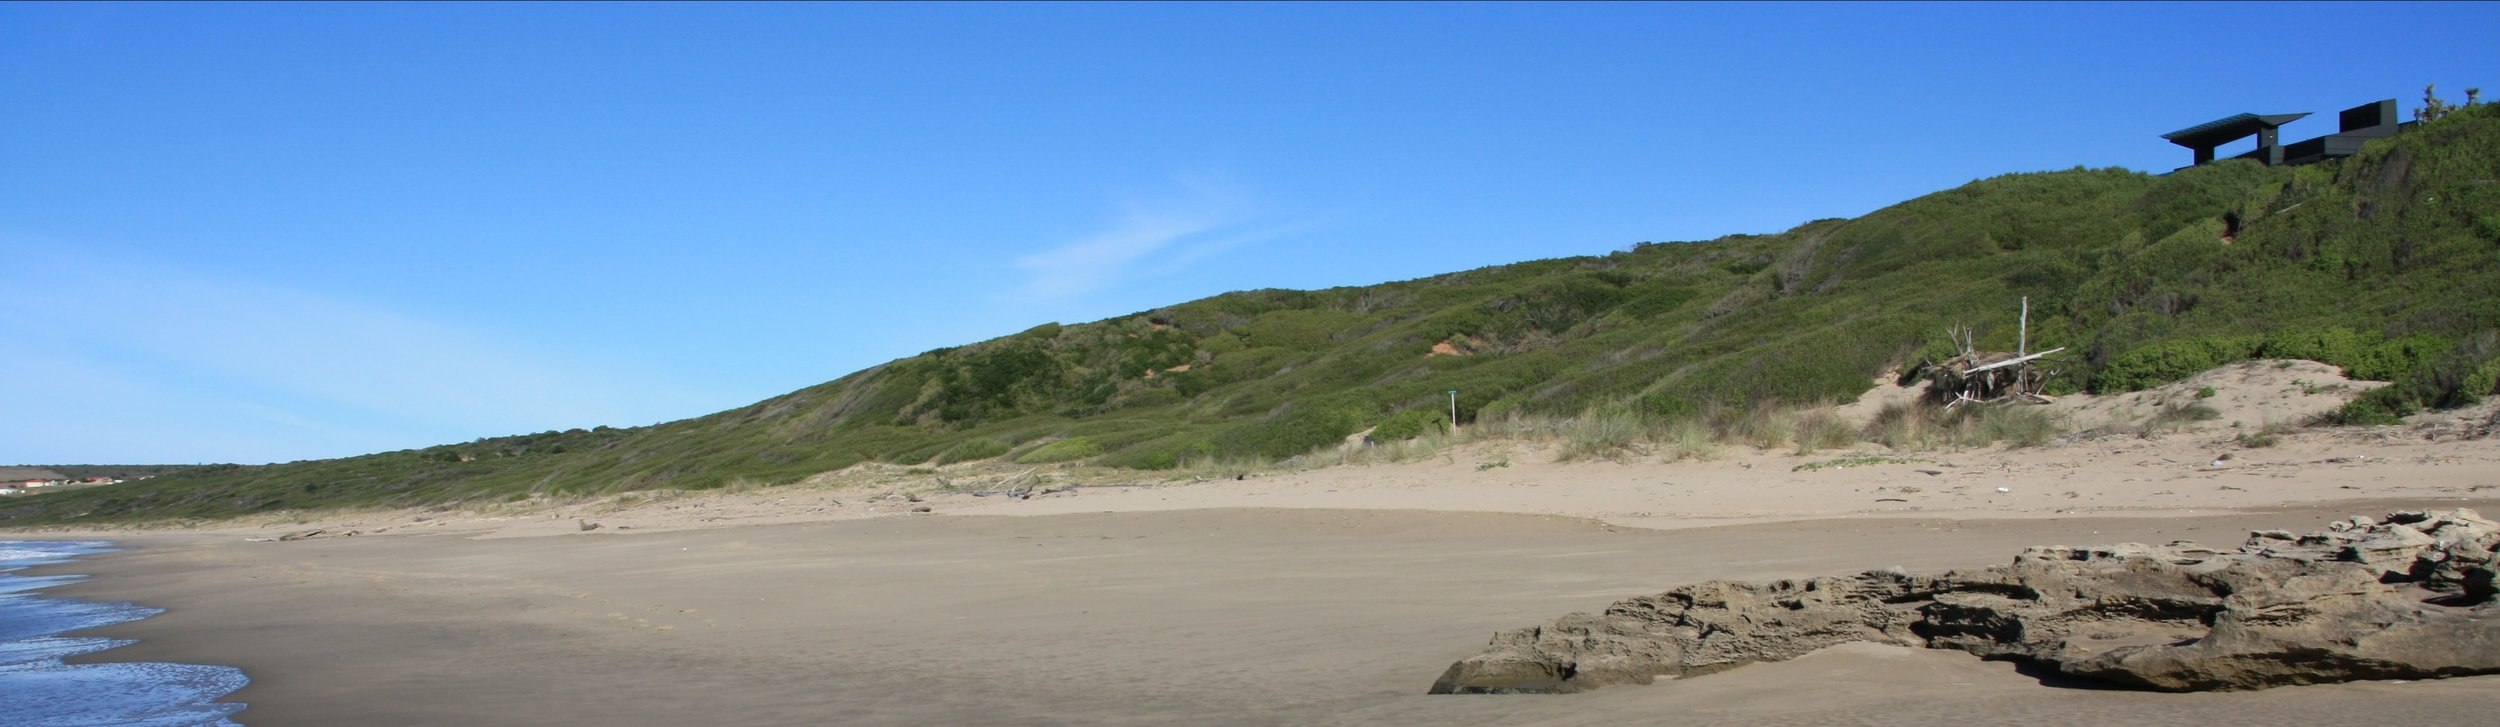 SAIA dune house 8.jpg